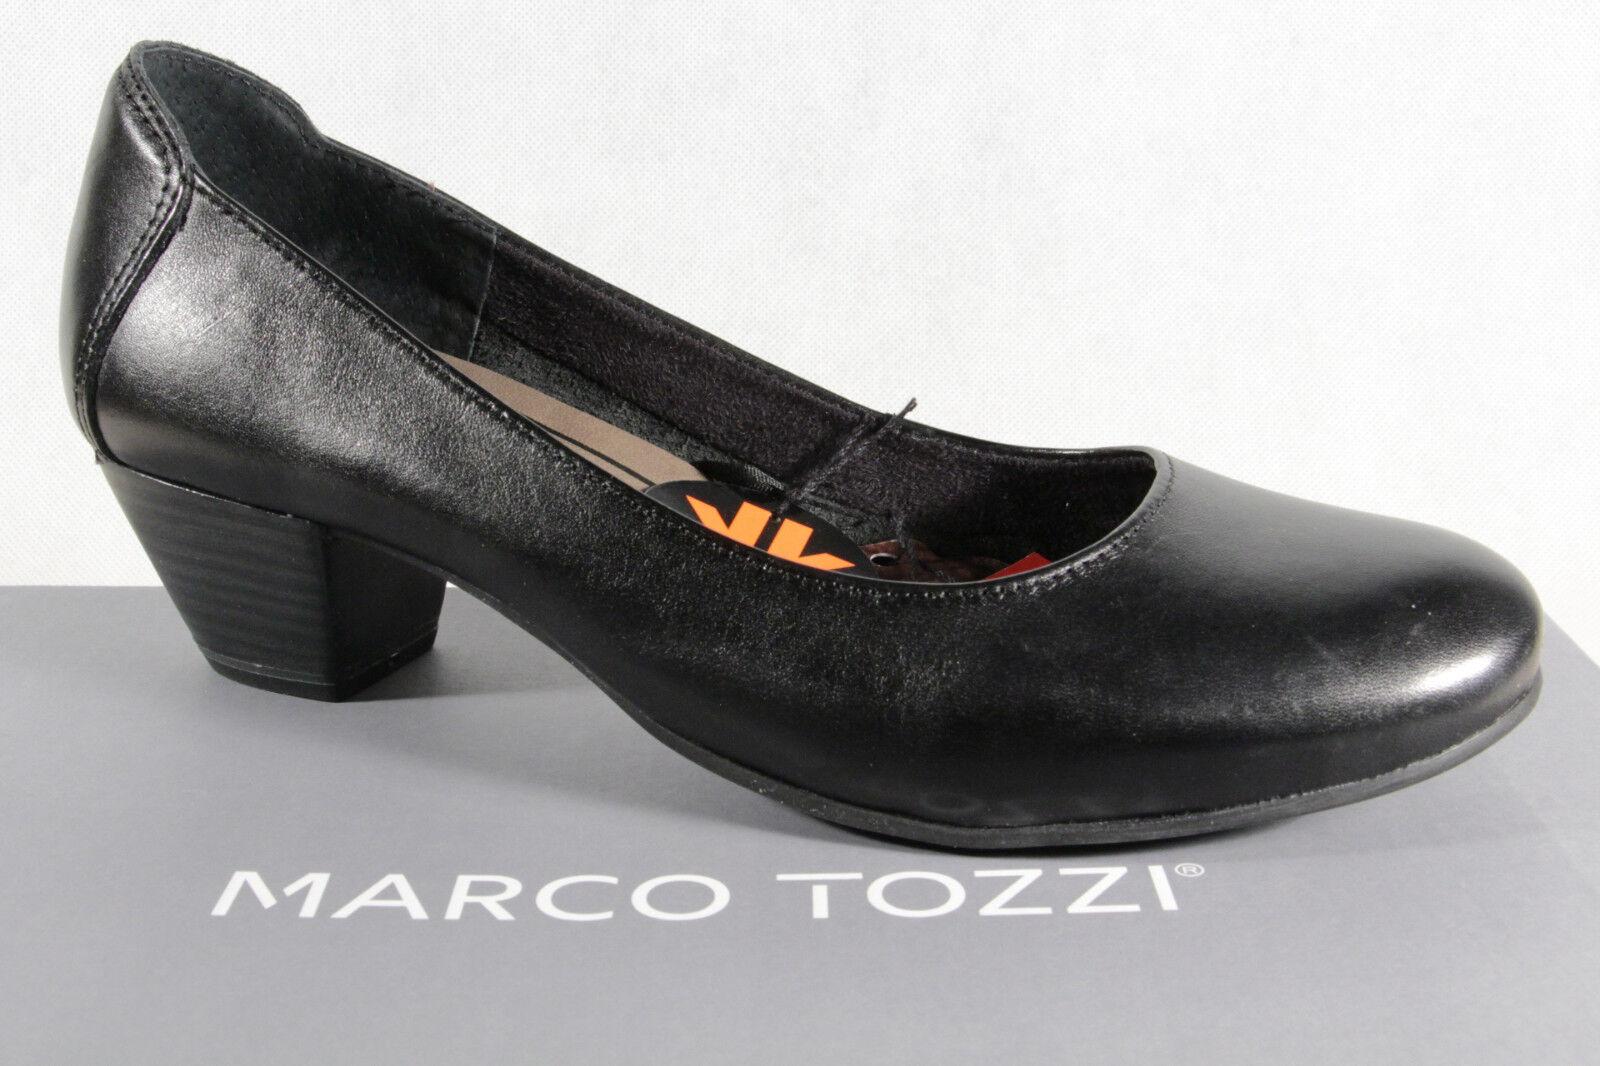 Marco Tozzi Décolleté Pantofole di Ballerina Nero Nuovo